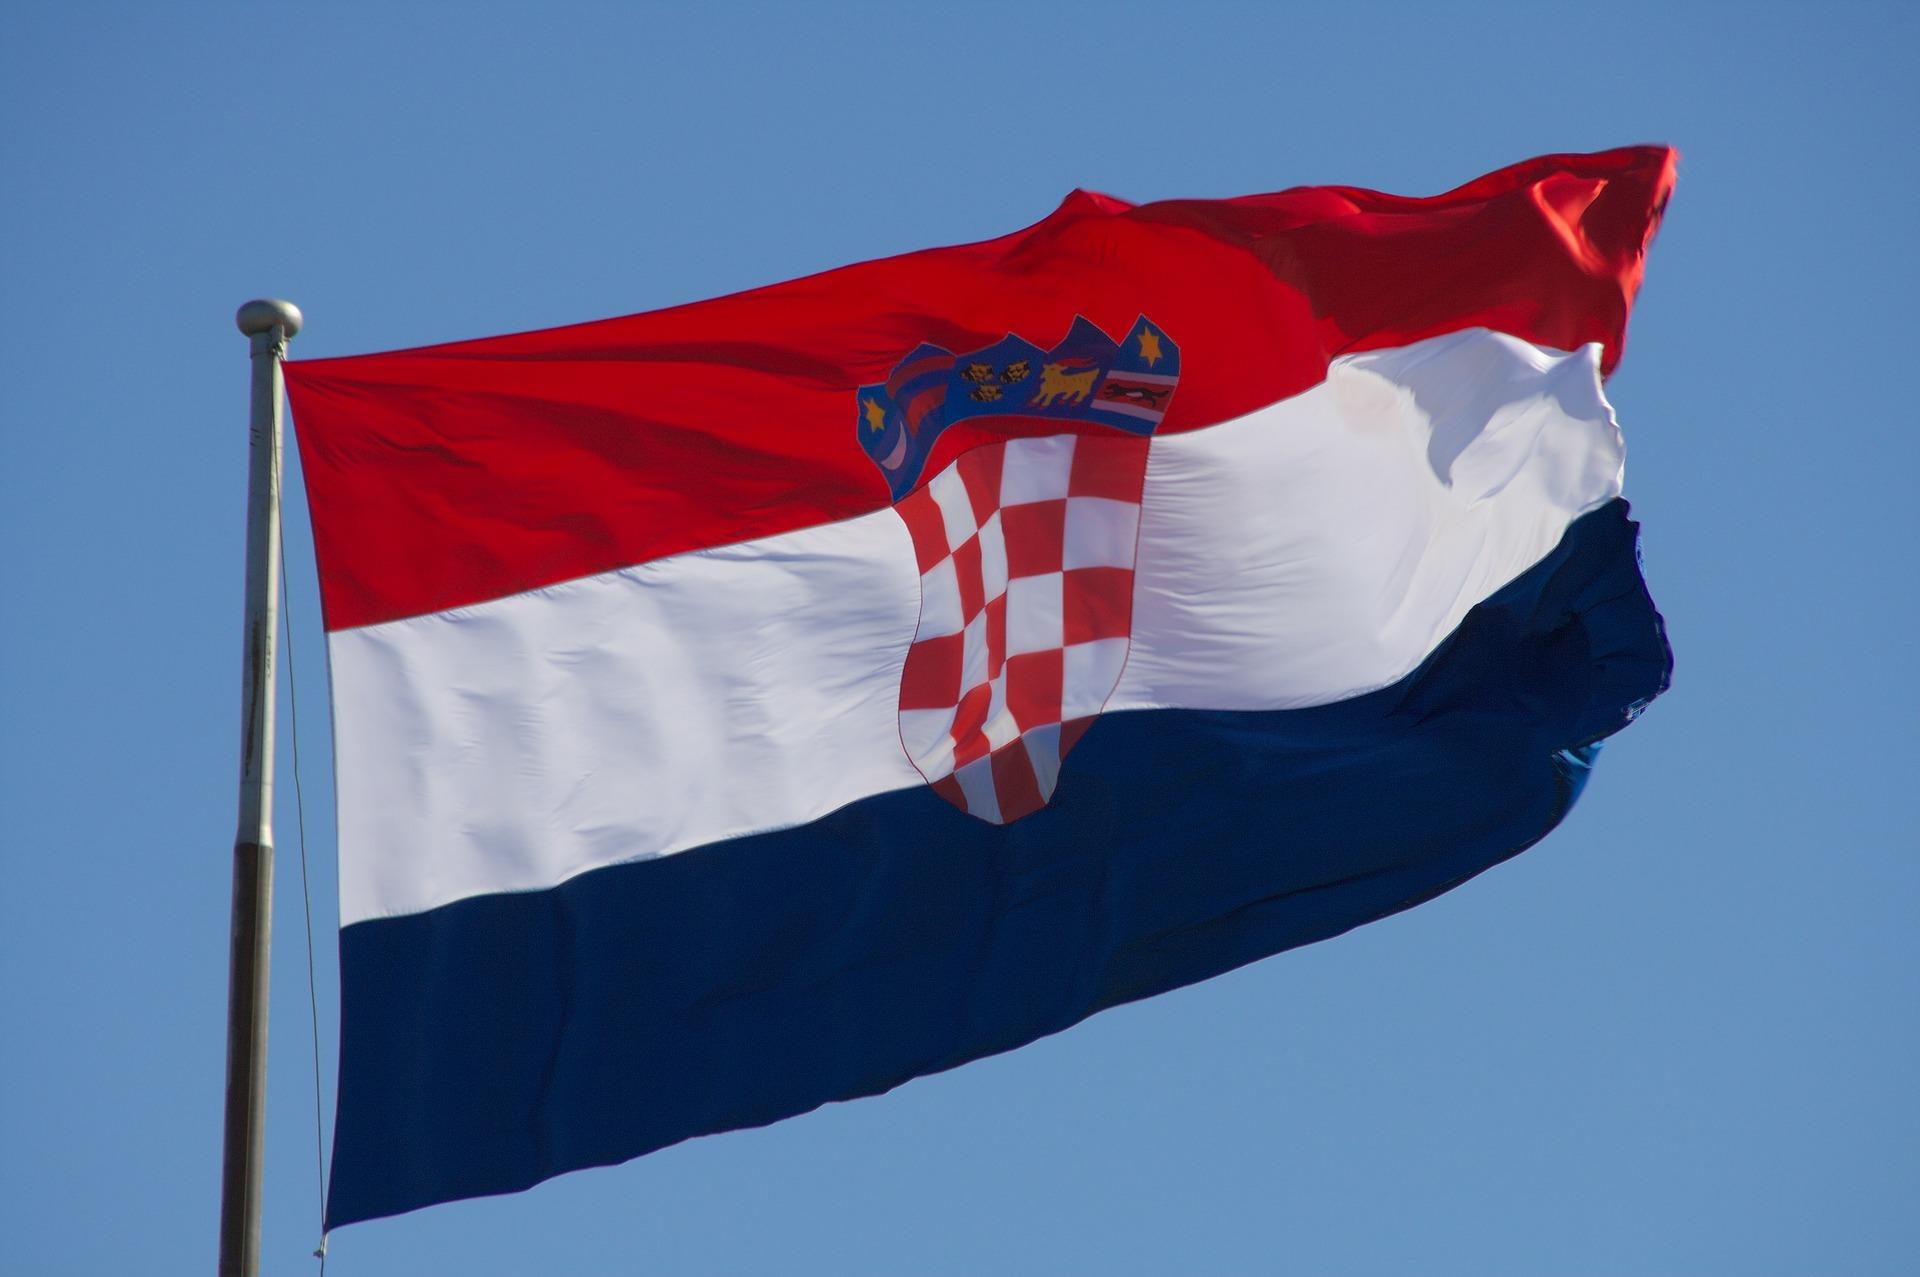 kroatische-nationalmannschaft